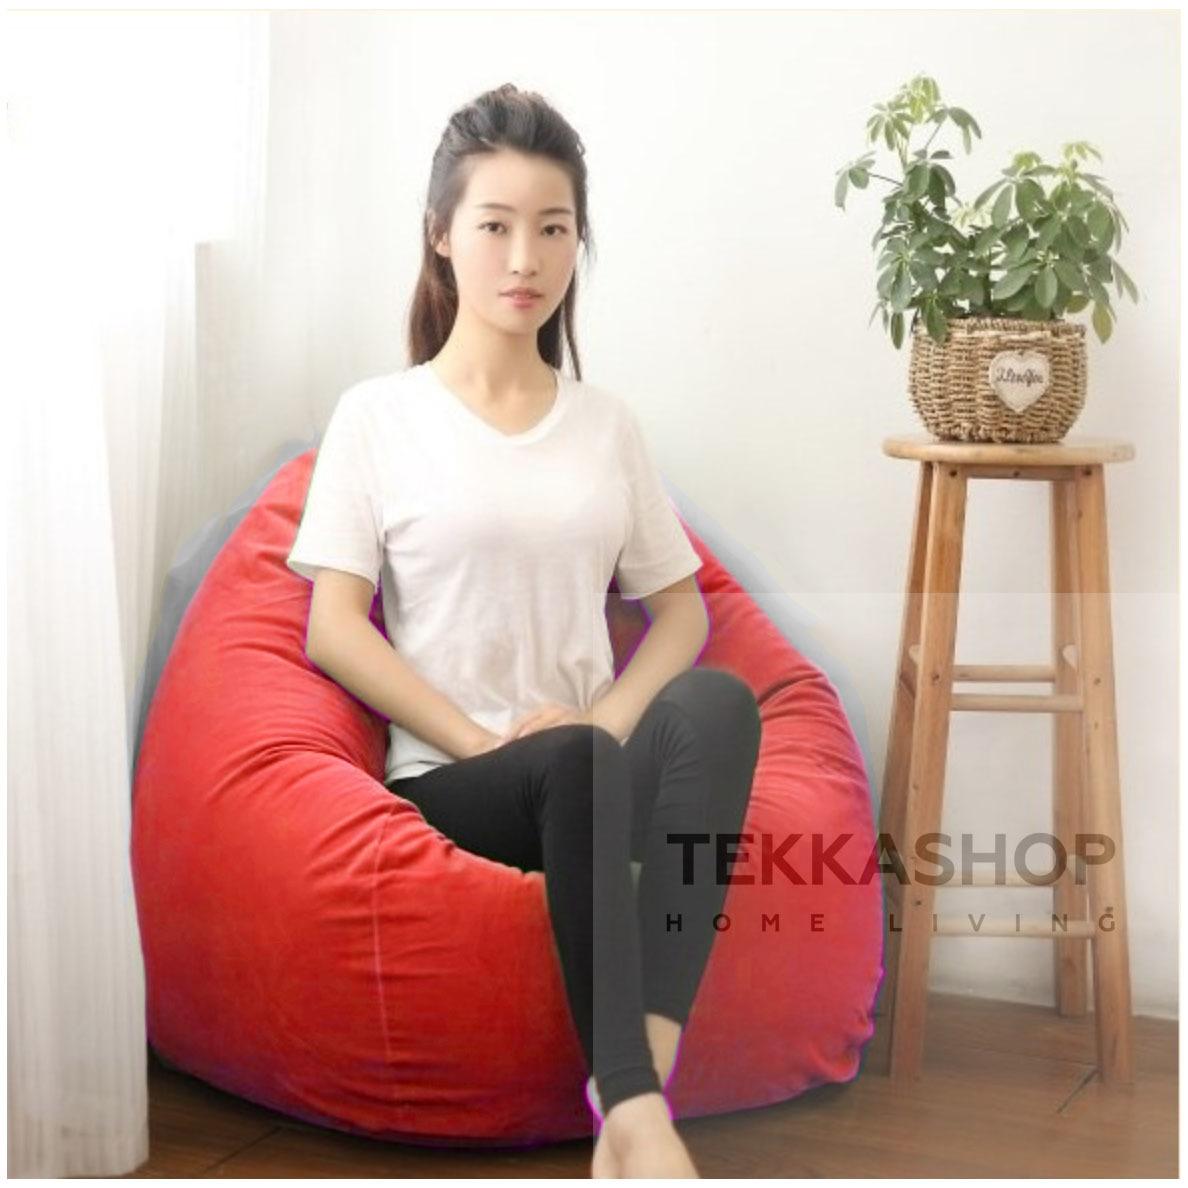 Astounding Tekkkashop Ssfbbr Colourful Fabric 3Kg Bean Bag 110Cm X 70Cm Red Uwap Interior Chair Design Uwaporg